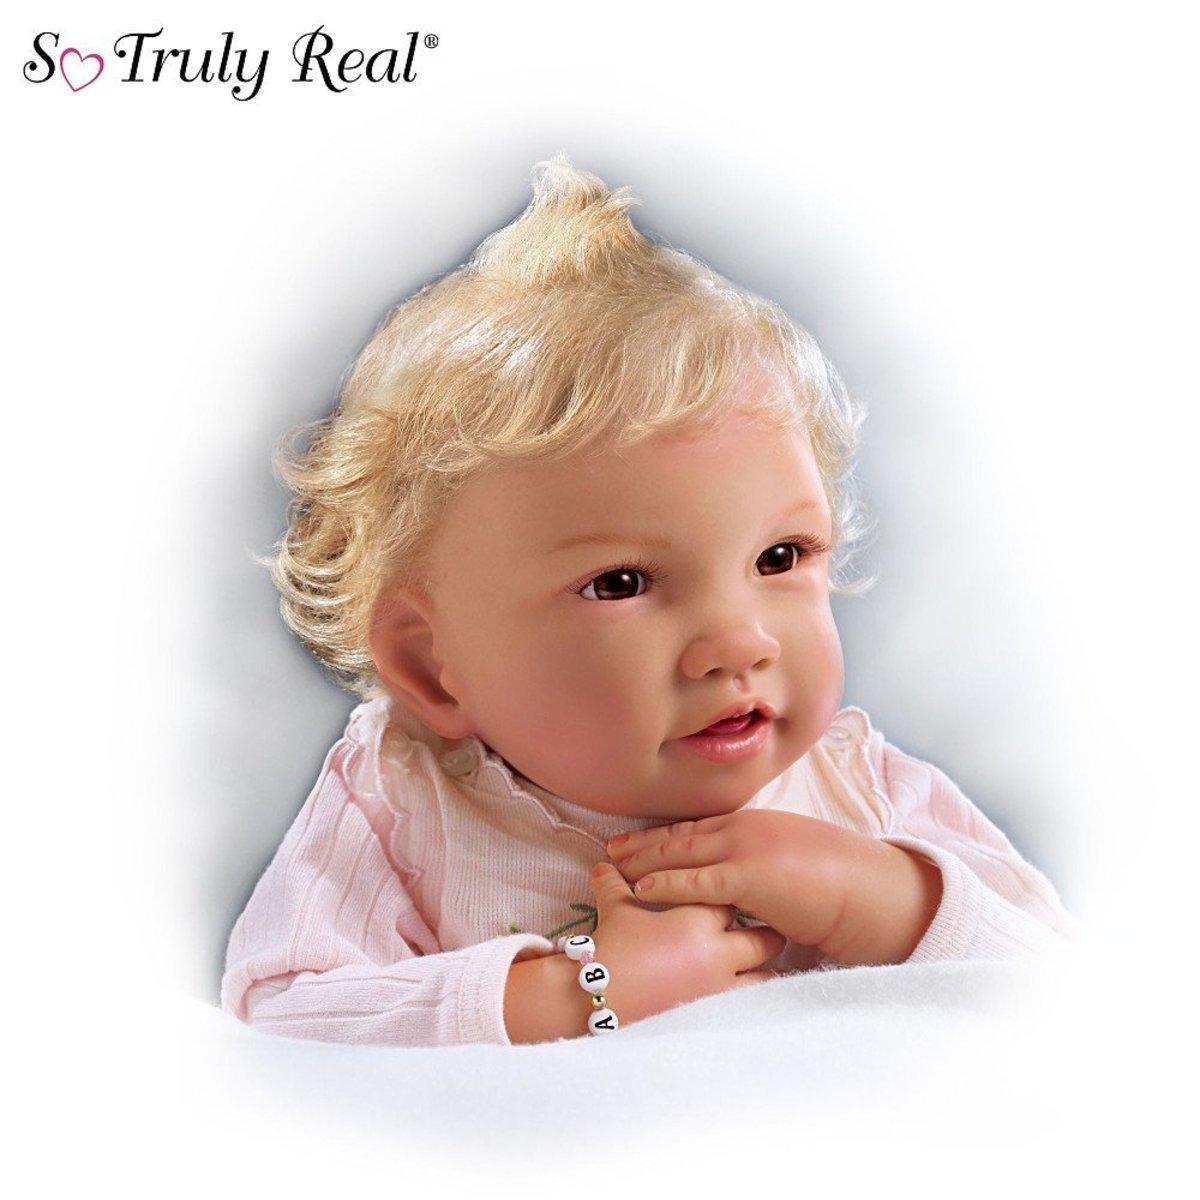 Reborn dolls are amazing!